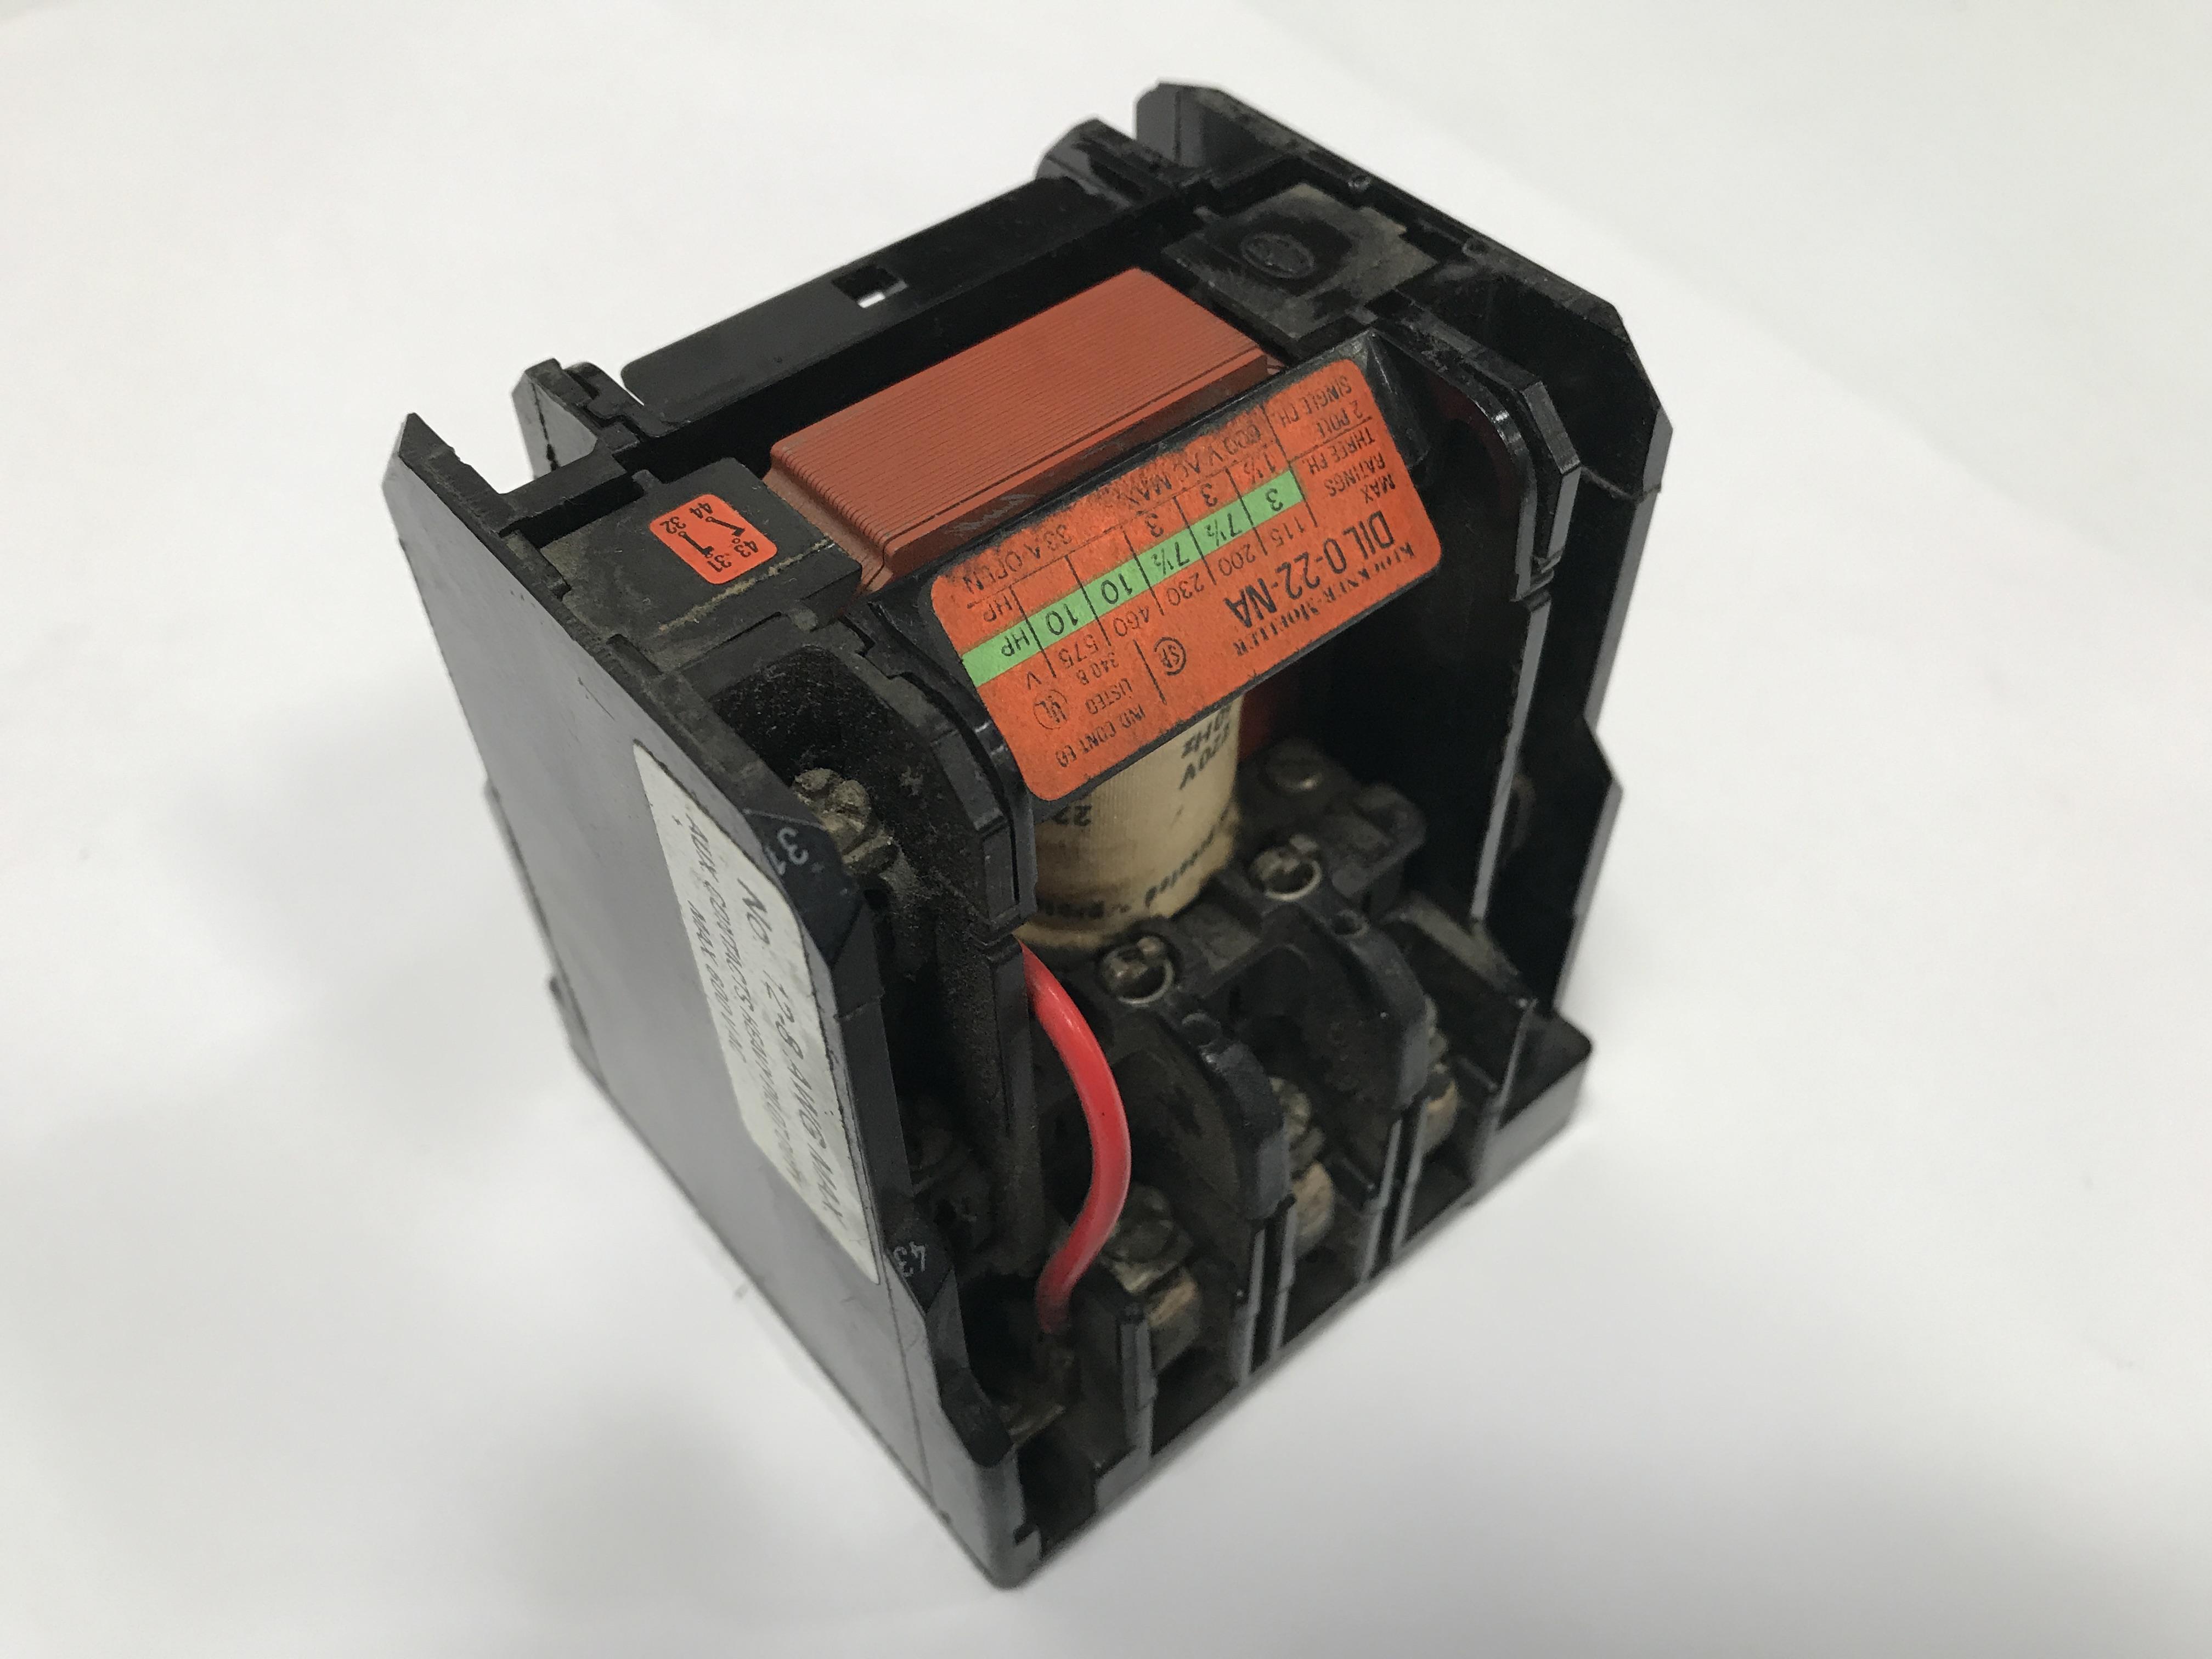 KLOCKNER MOELLER DIL 0-22-NA (contactor)